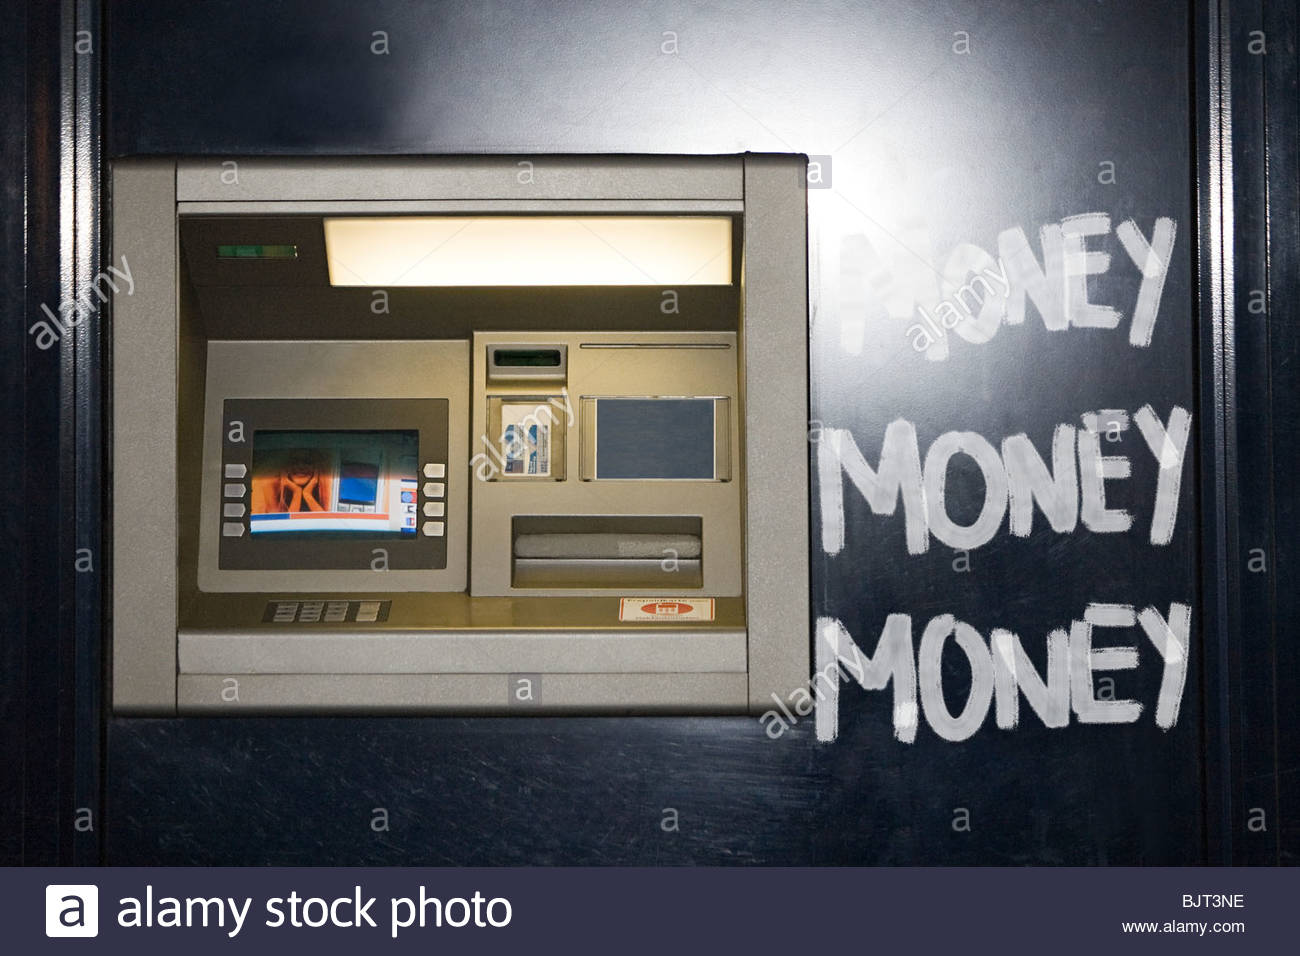 Money written next to an atm - Stock Image